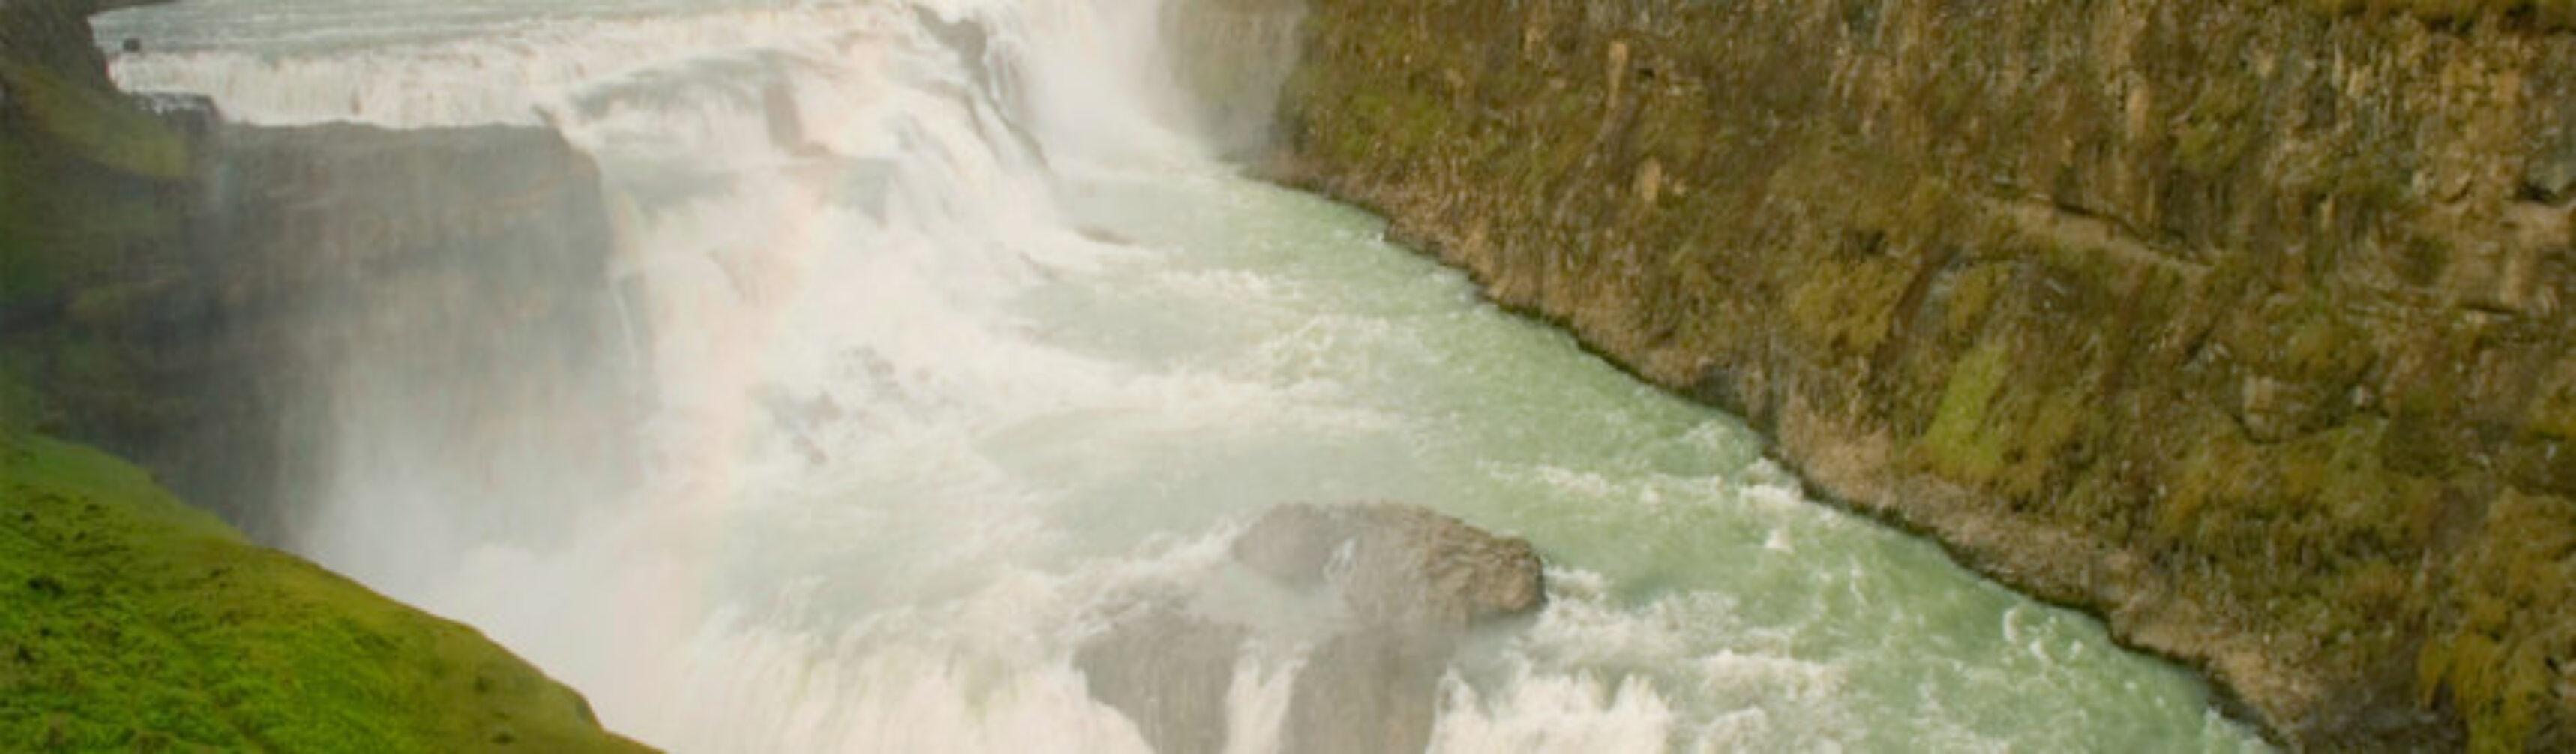 Day-016_01-Eric-Scott-I-Hear-Waterfalls